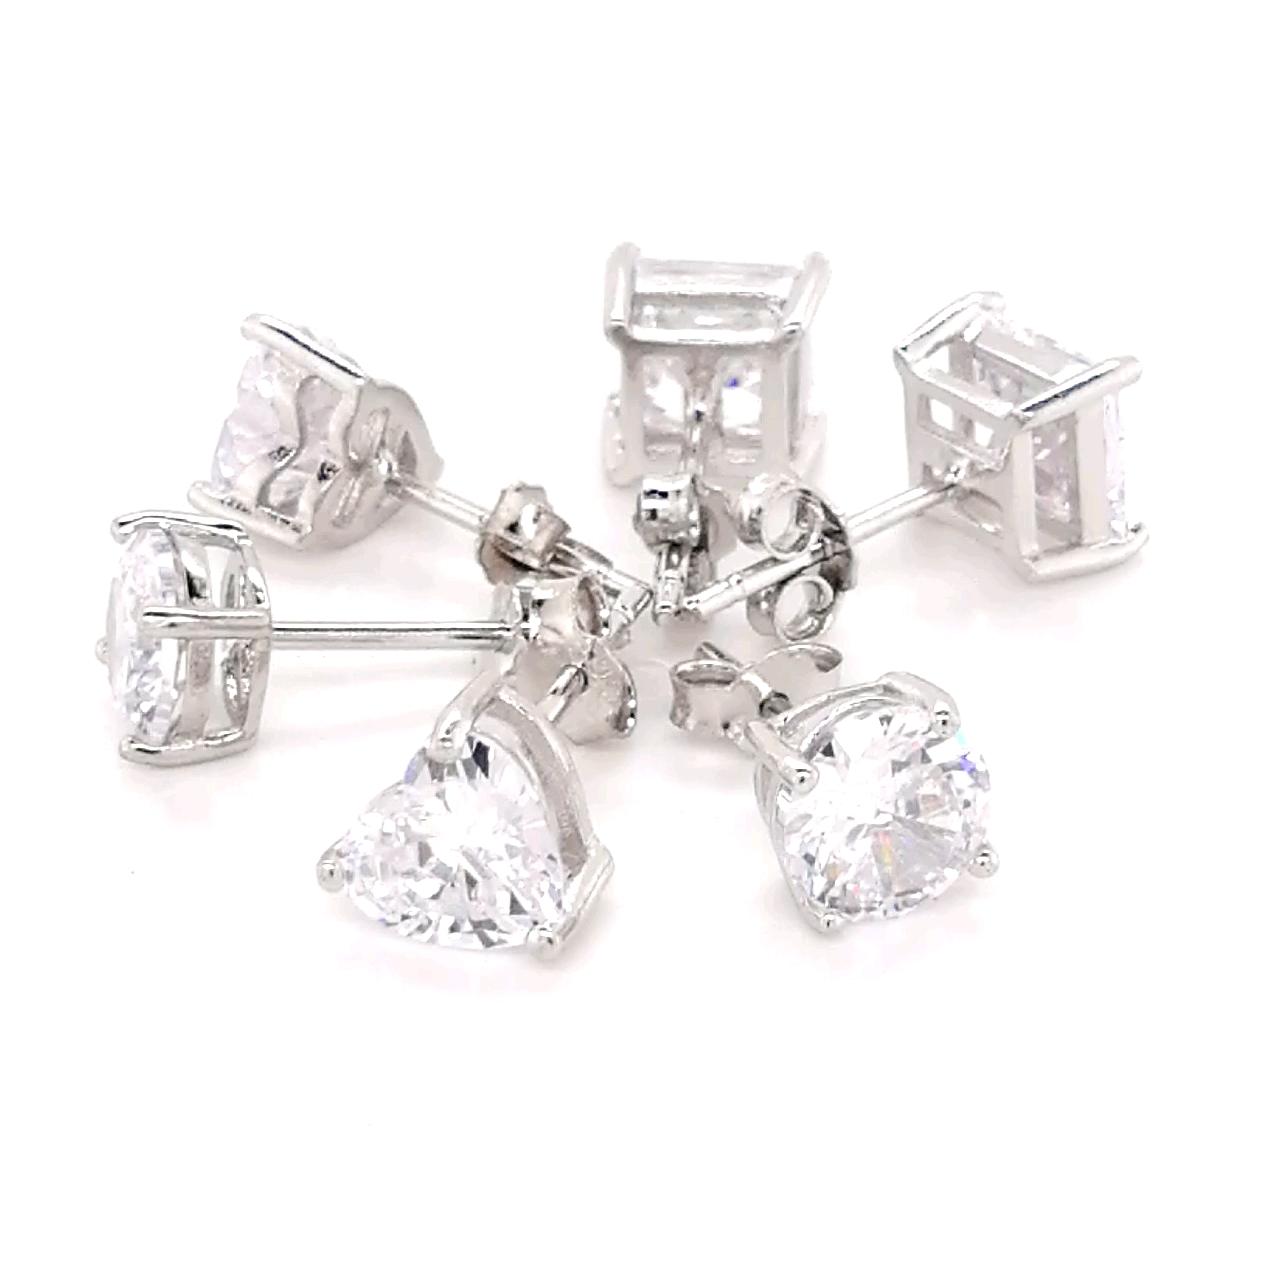 6mm Sterling Silber Elemente Bolzen Ohrring und 925 Silber Mode Ohrring Schmuck 2020